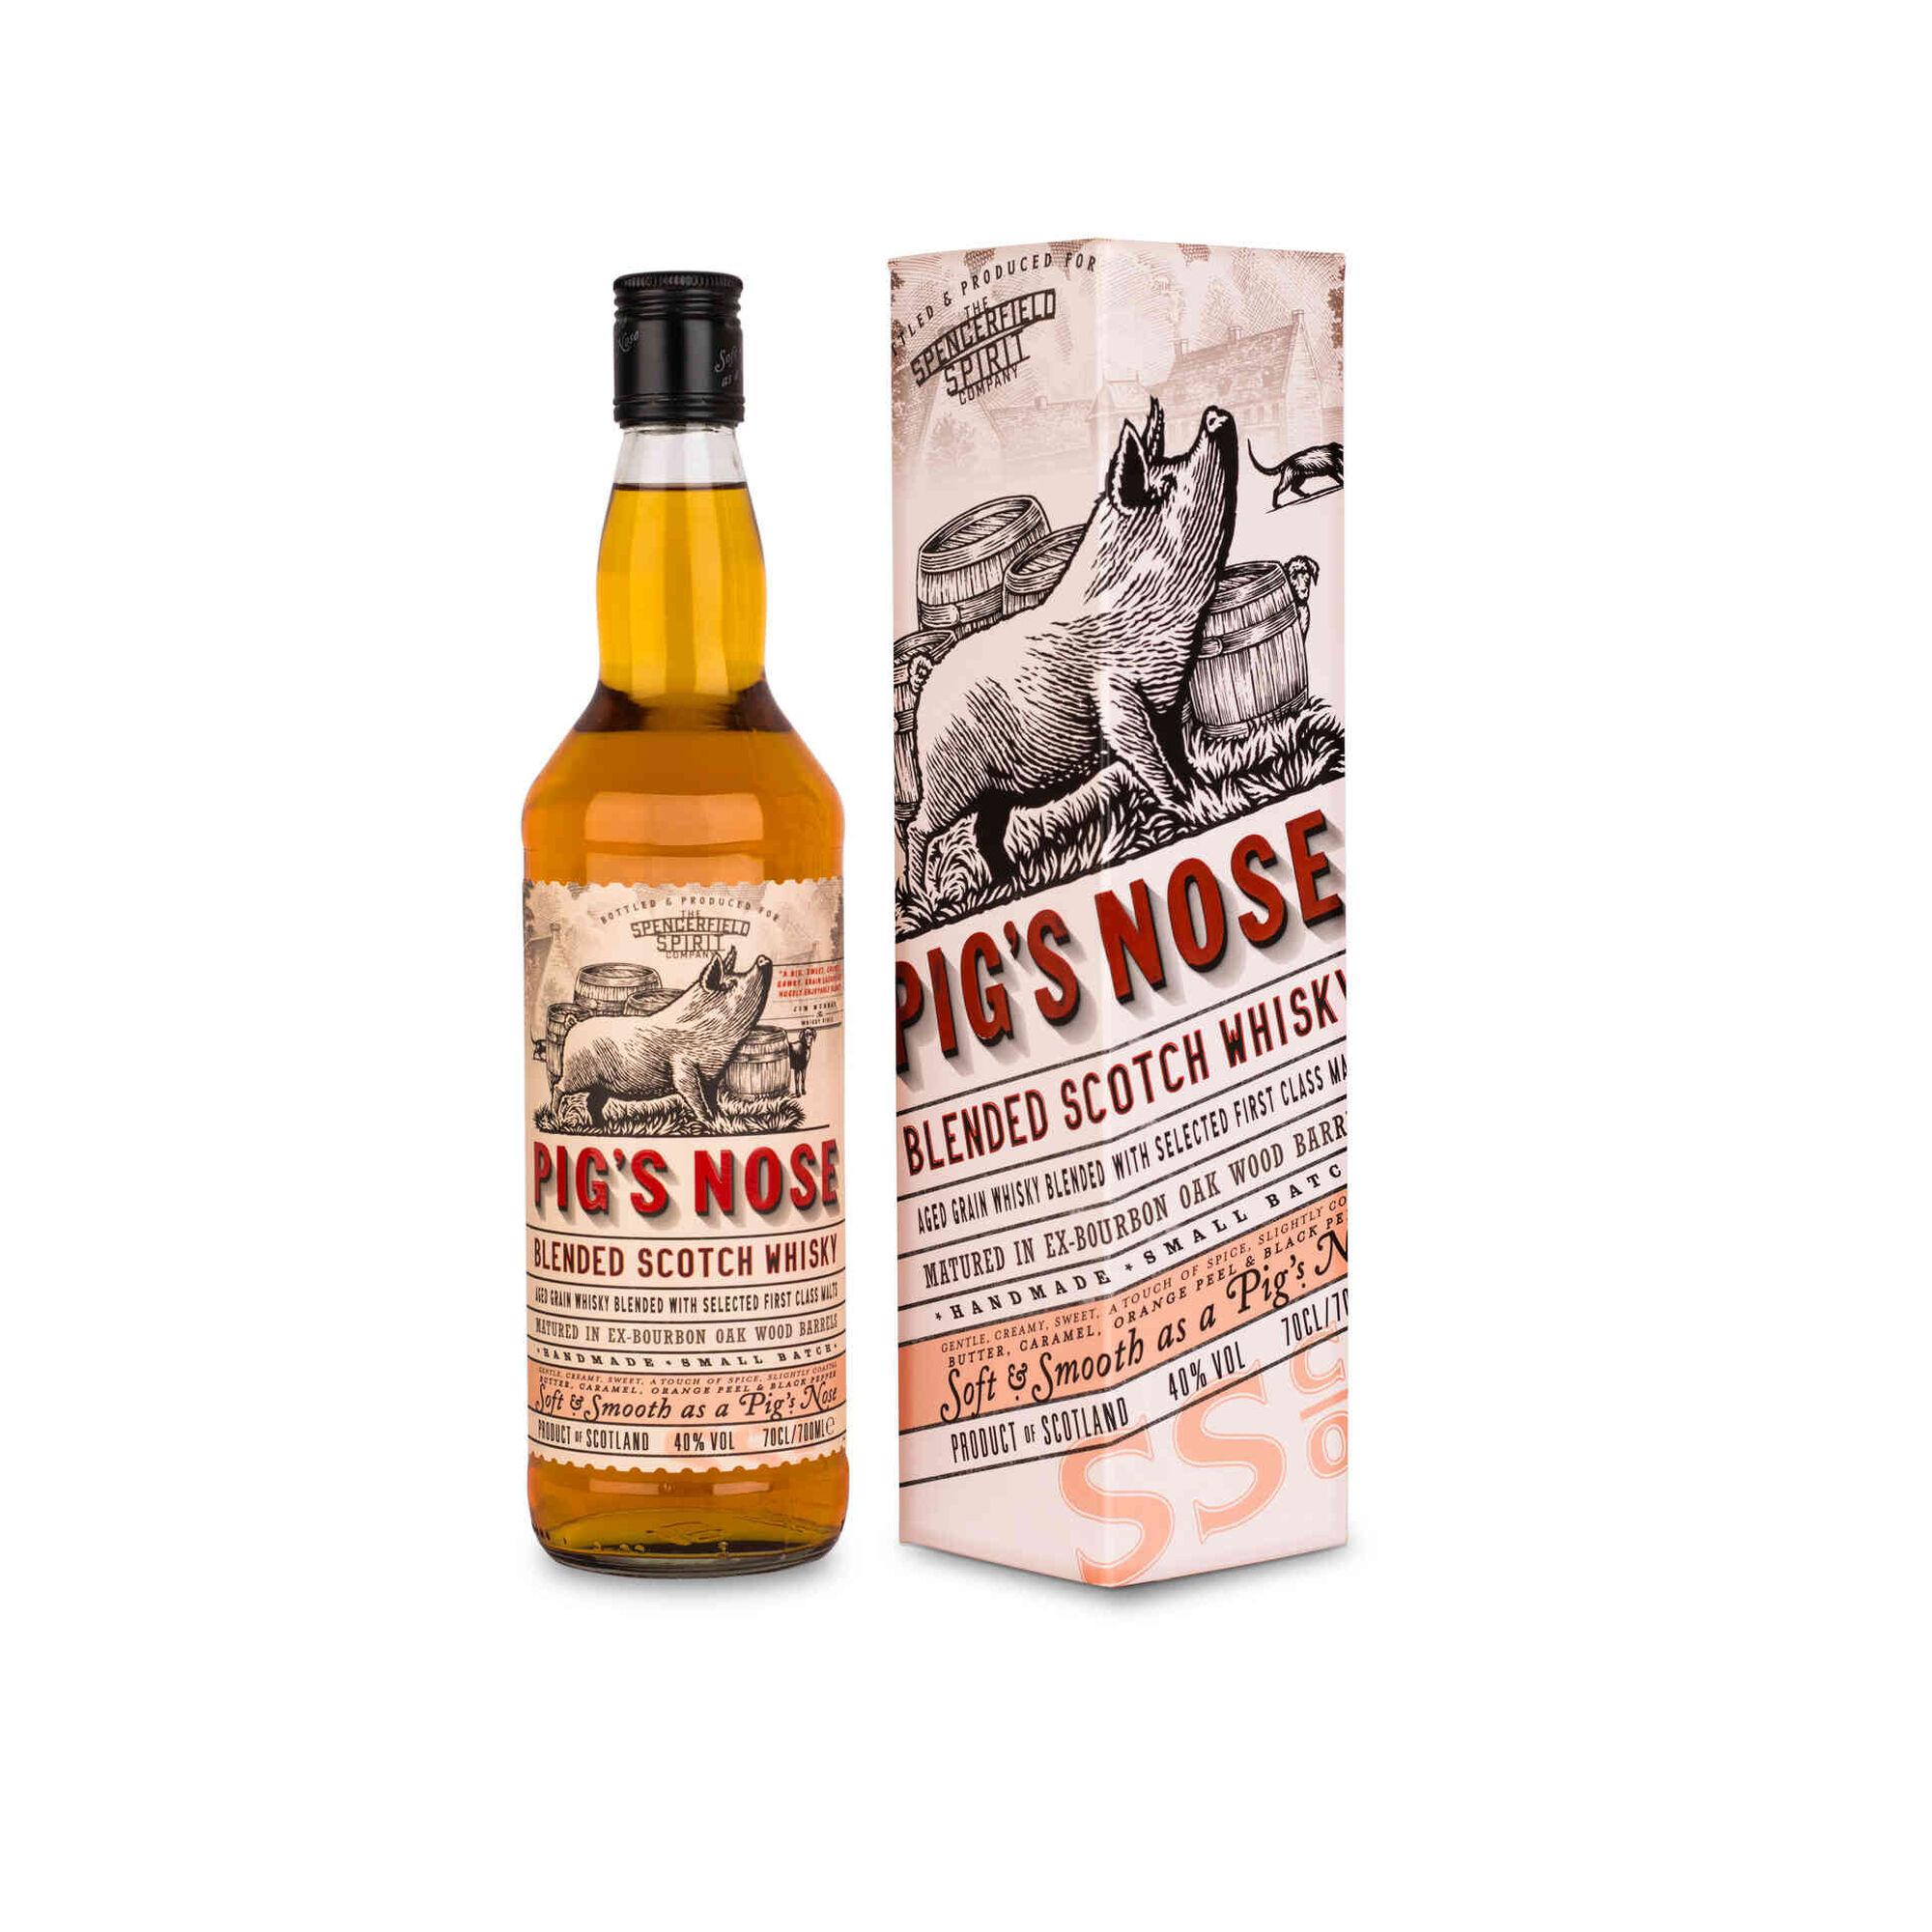 Whisky Pig's Nose Blended